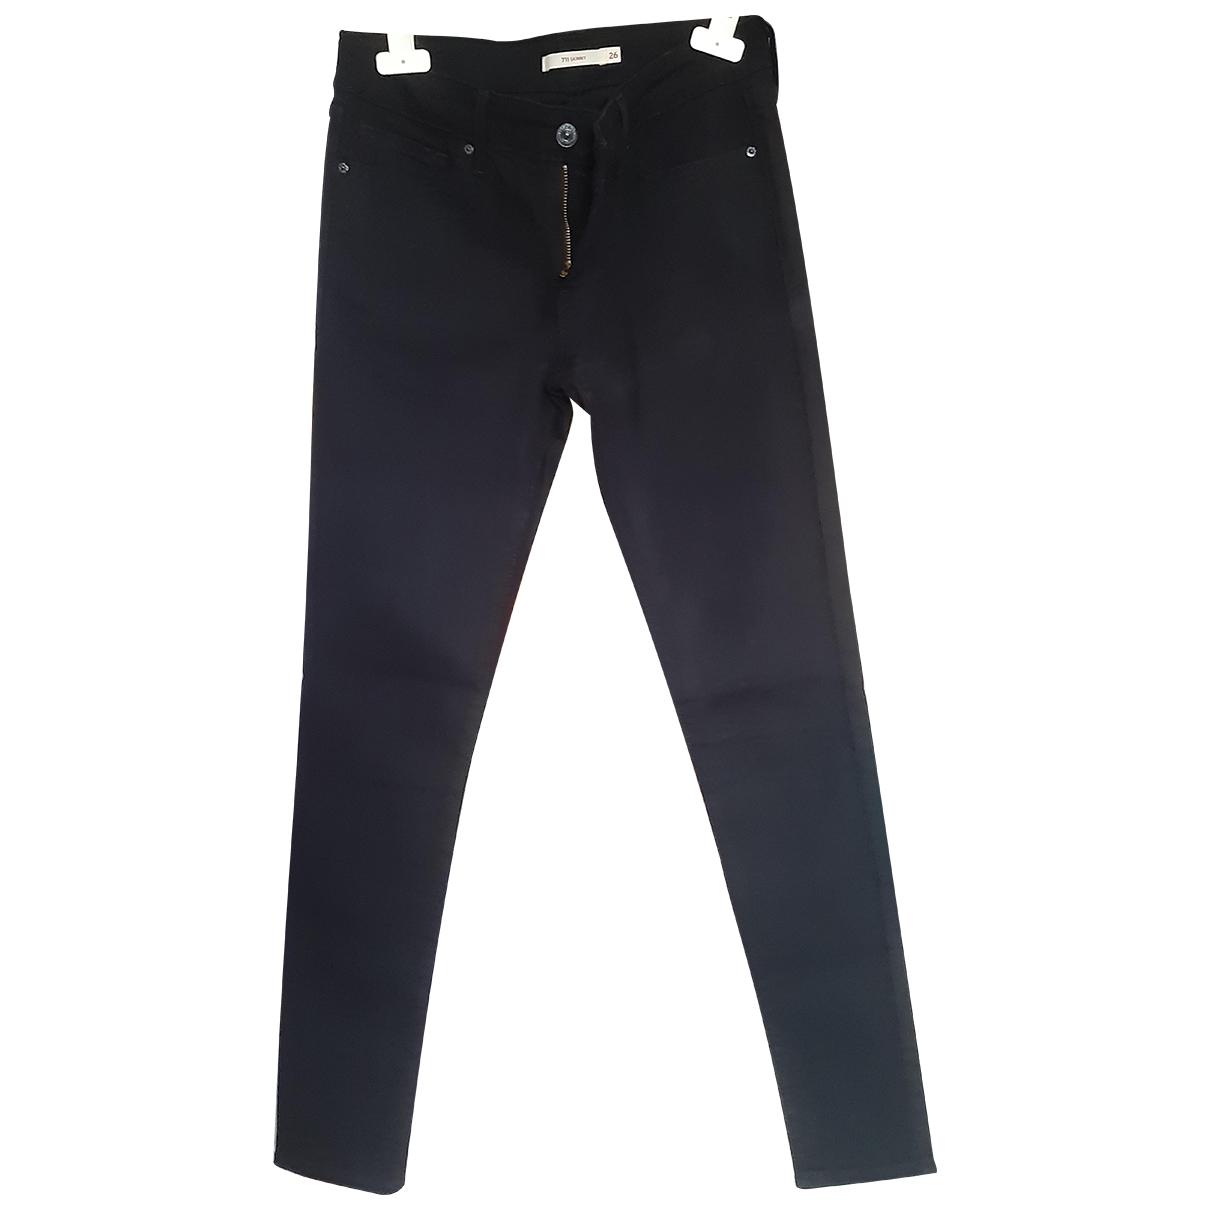 Levi's N Black Cotton - elasthane Jeans for Women 26 US